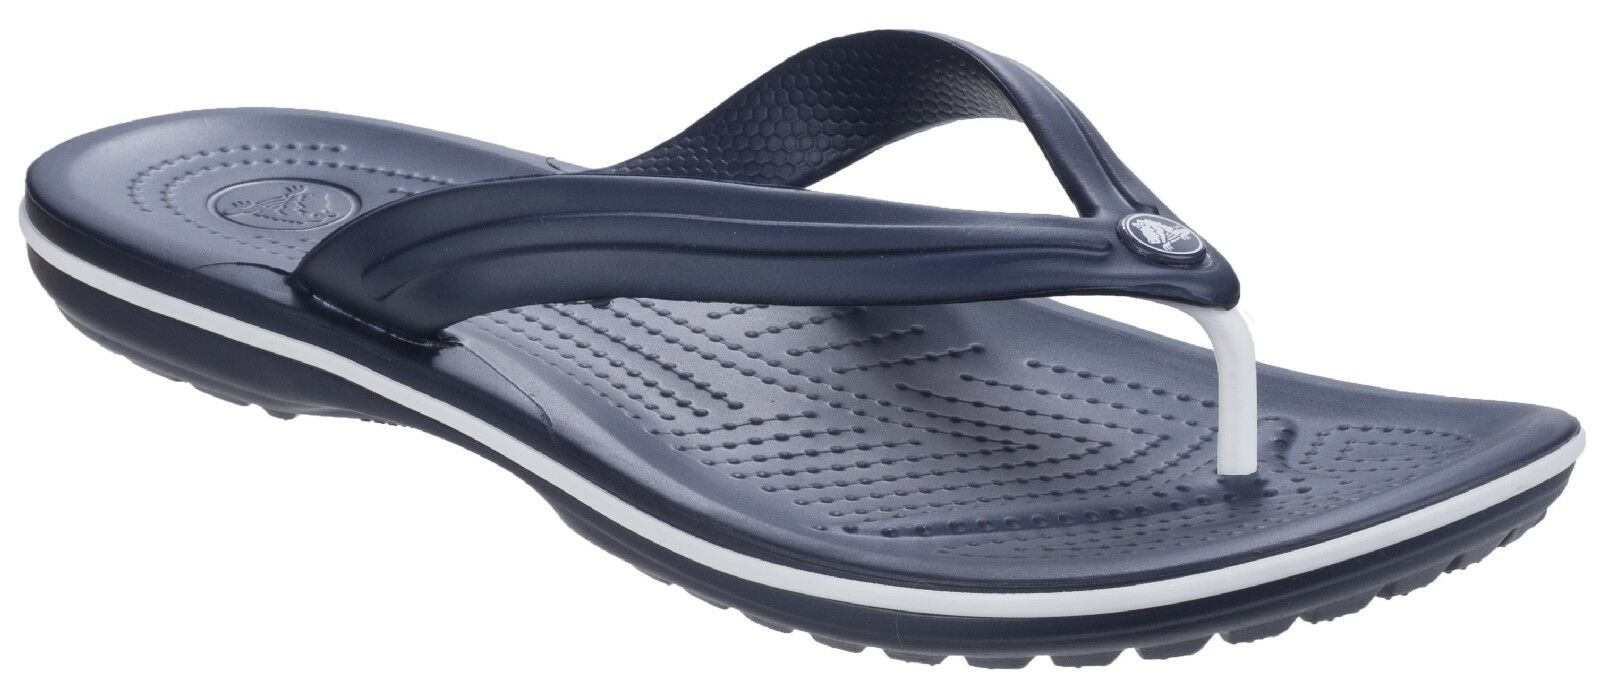 3e2788cd568b Crocs Crocband Flip Flops Sandals Unisex Lightweight Toe Post Mens Womens  Slides